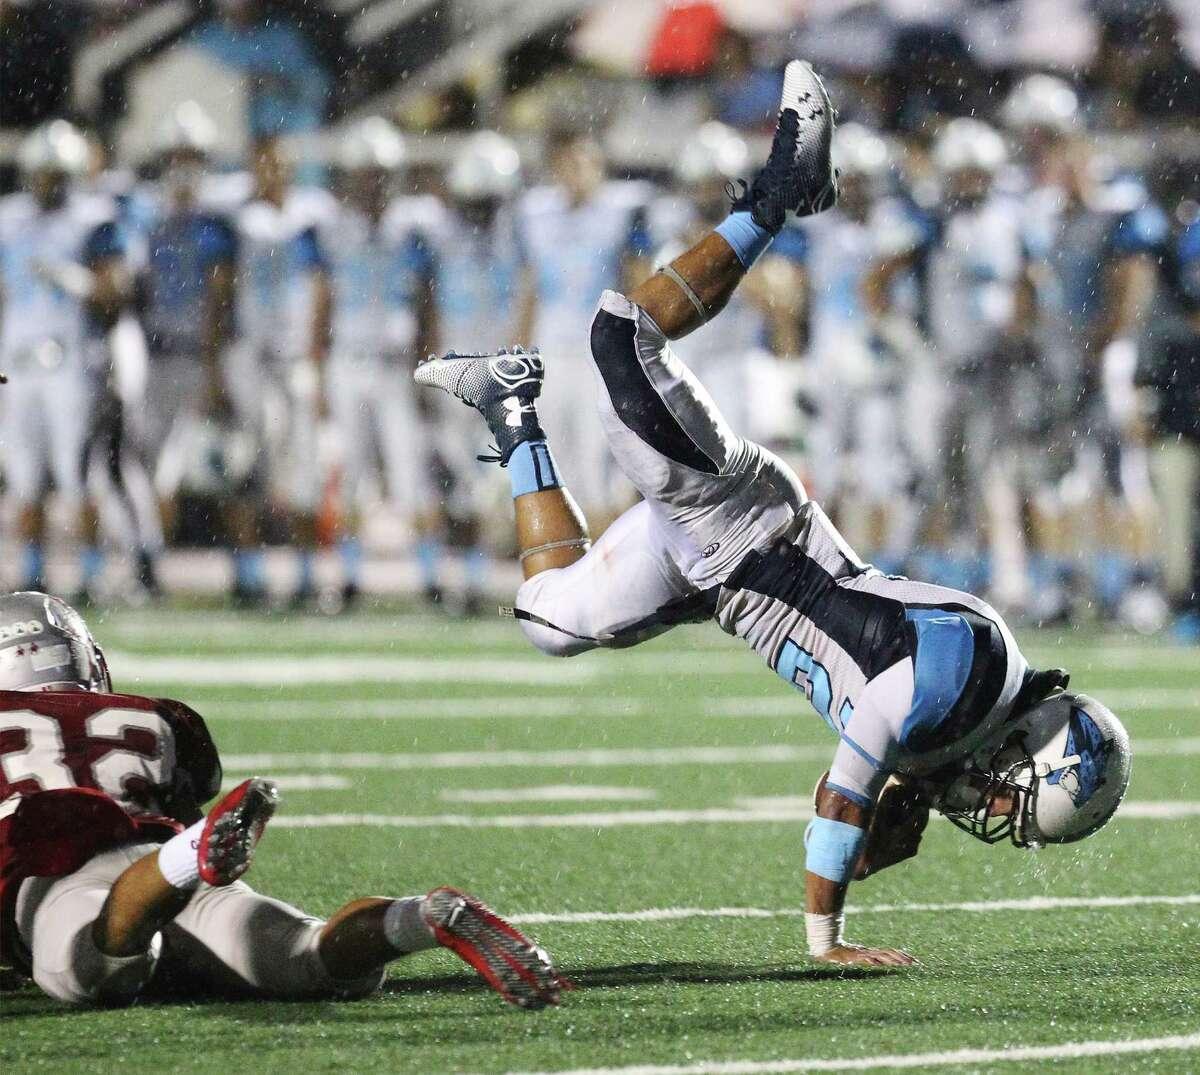 Johnson's R.J. Espinoza (21) gets tripped up by Lee's Adrian Vargas (32) at Comalander Stadium on Friday, Sept. 26, 2014. (Kin Man Hui/San Antonio Express-News)